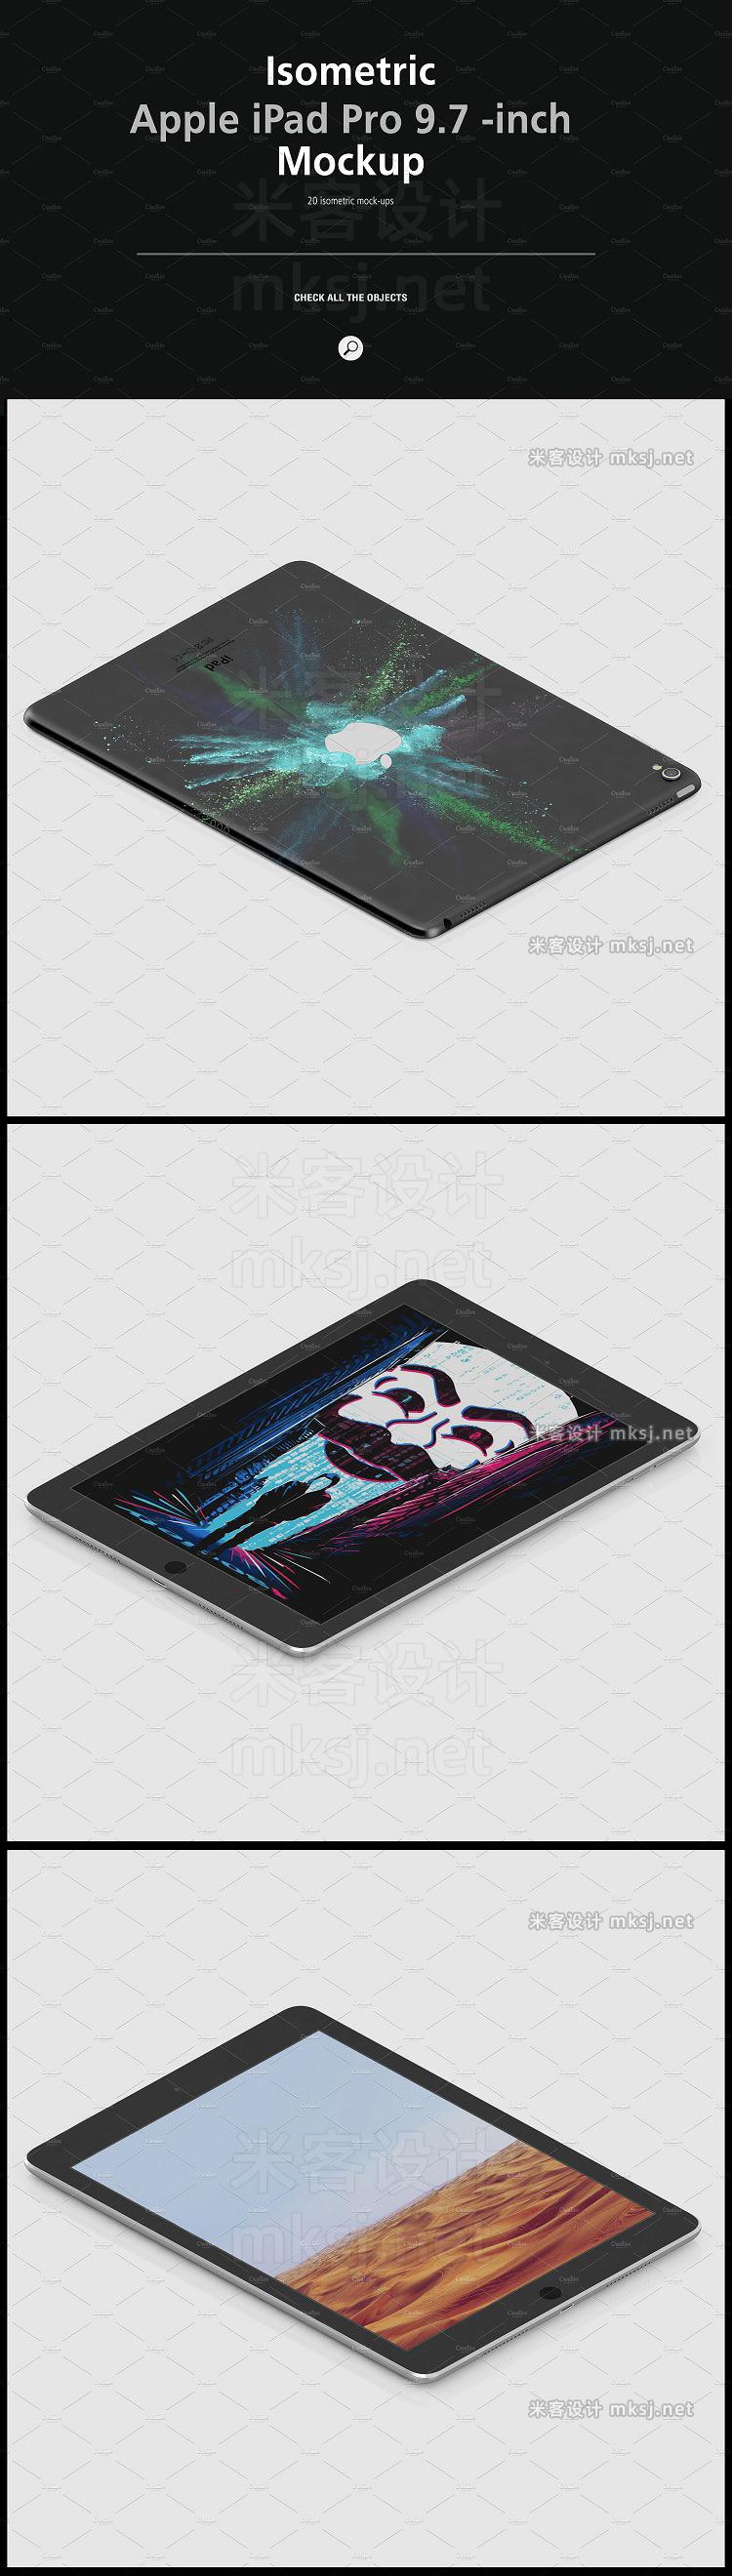 VI贴图 苹果 Apple iPad Pro 9.7 展示 PS模型mockup样机